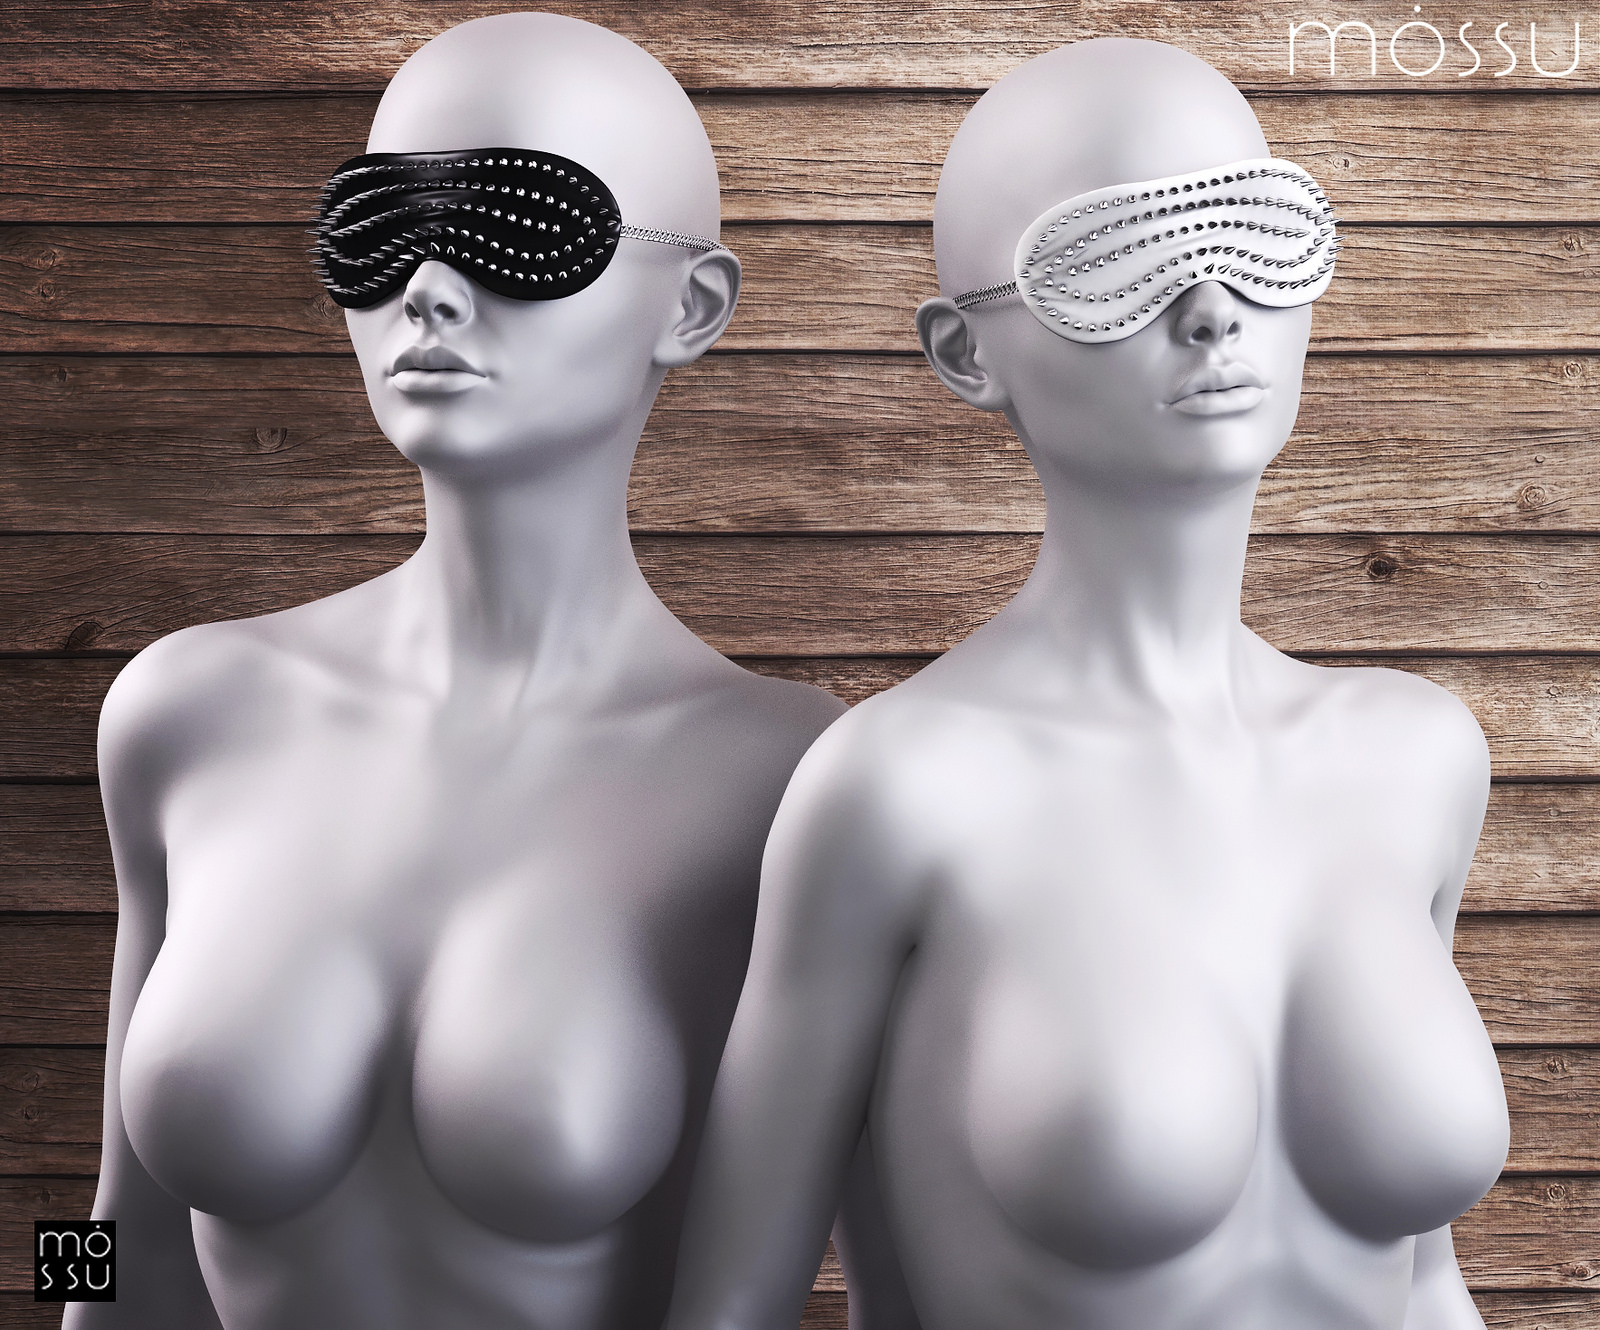 Mossu - Saba Blindfold